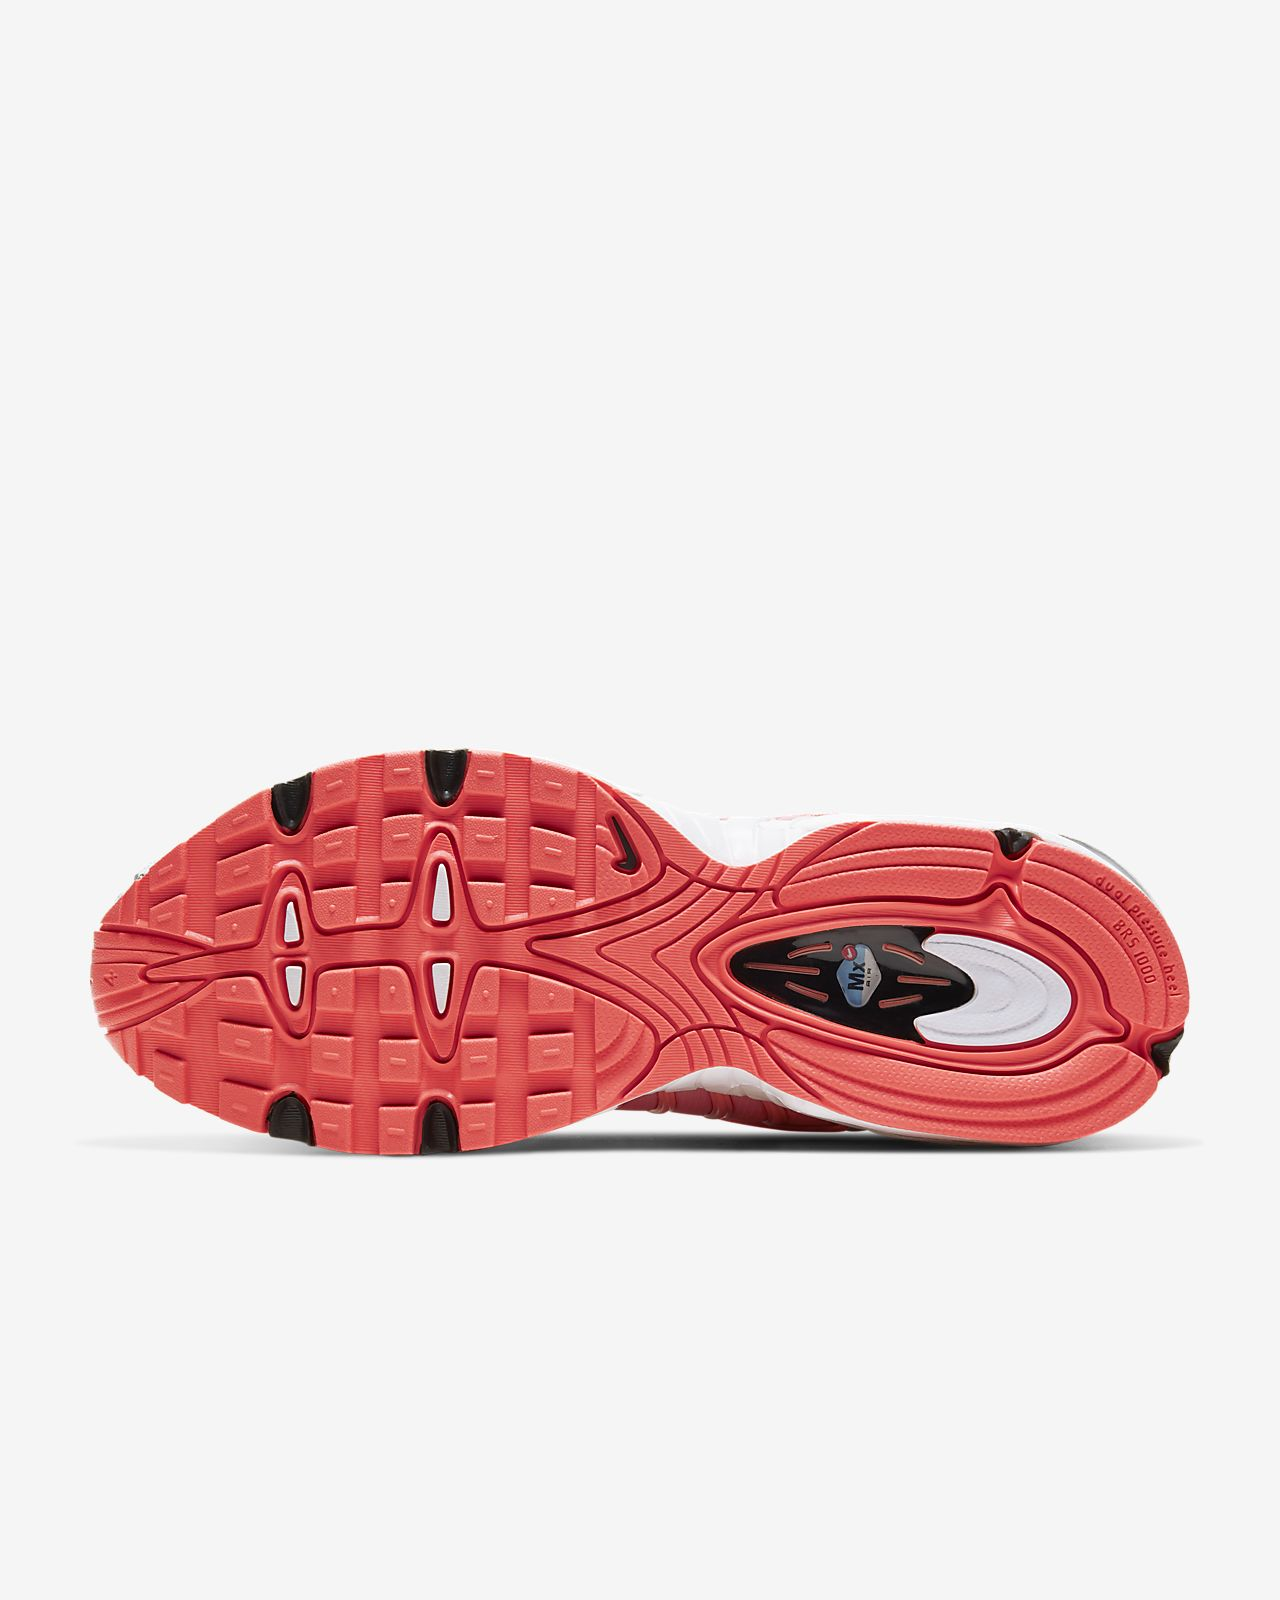 Residuos Puntero Diligencia  Dámská bota Nike Air Max Tailwind IV. Nike CZ